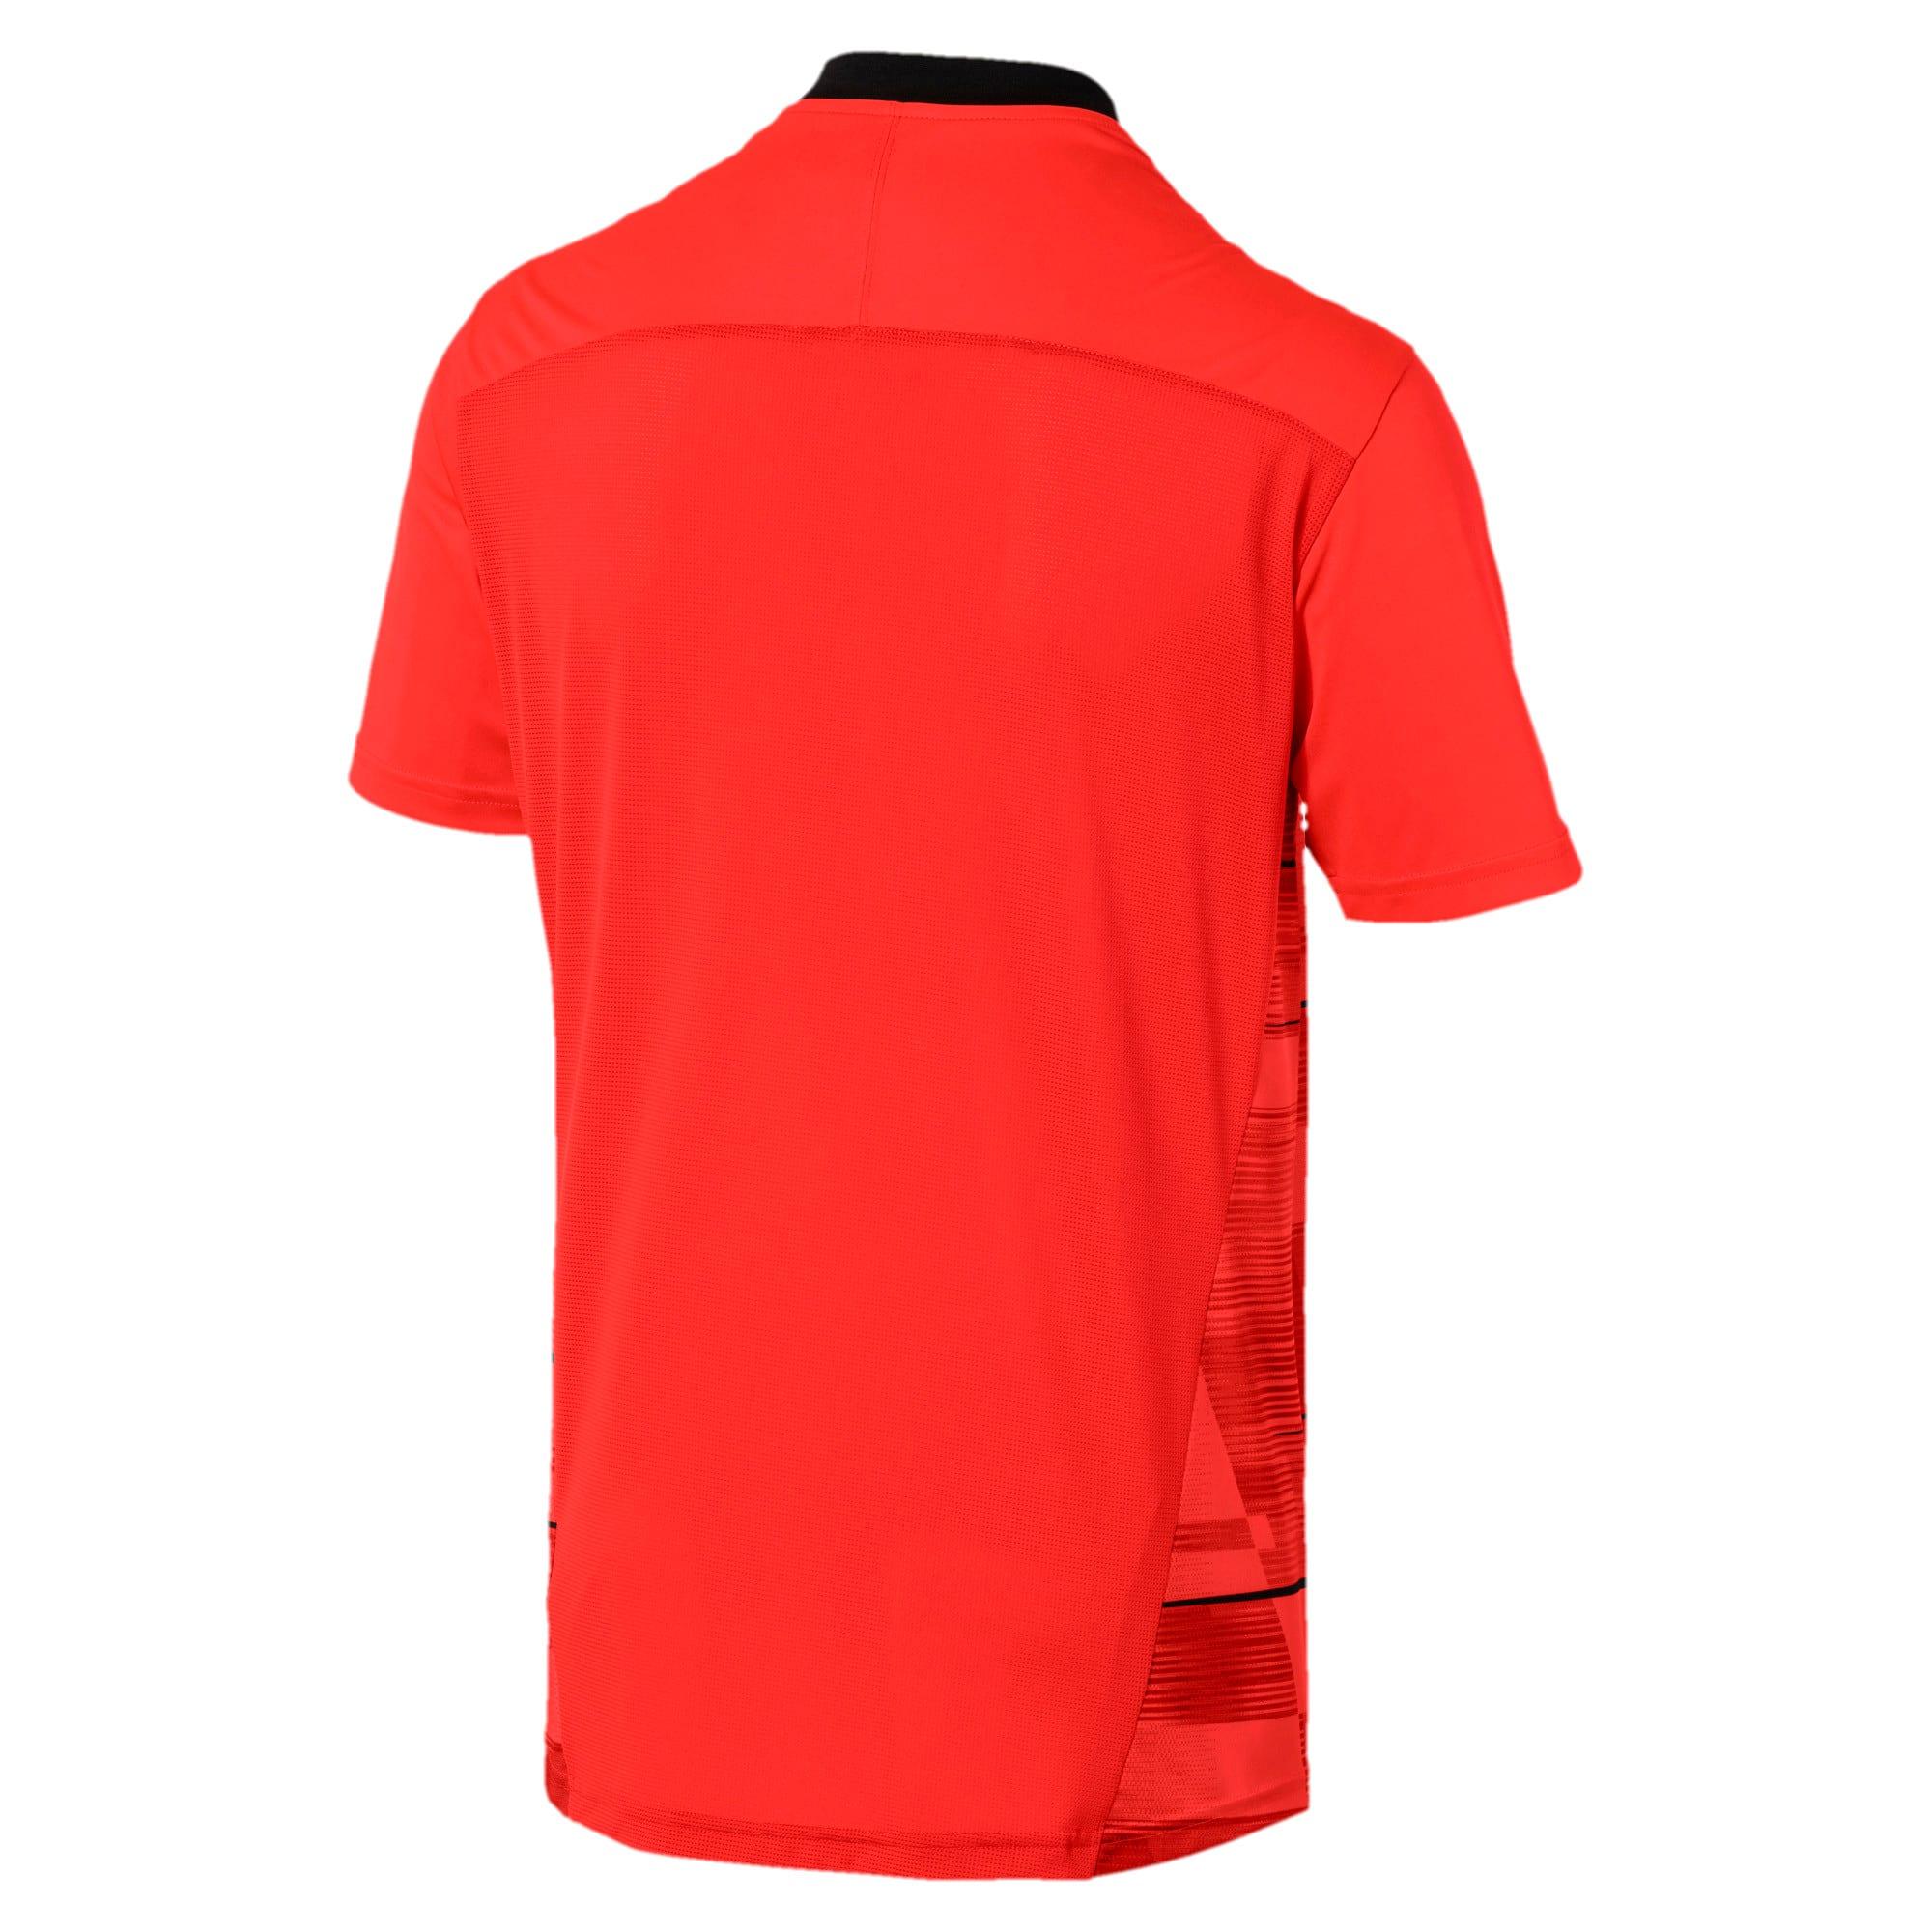 Thumbnail 5 of ftblNXT Men's Graphic Shirt, Nrgy Red-Puma Black, medium